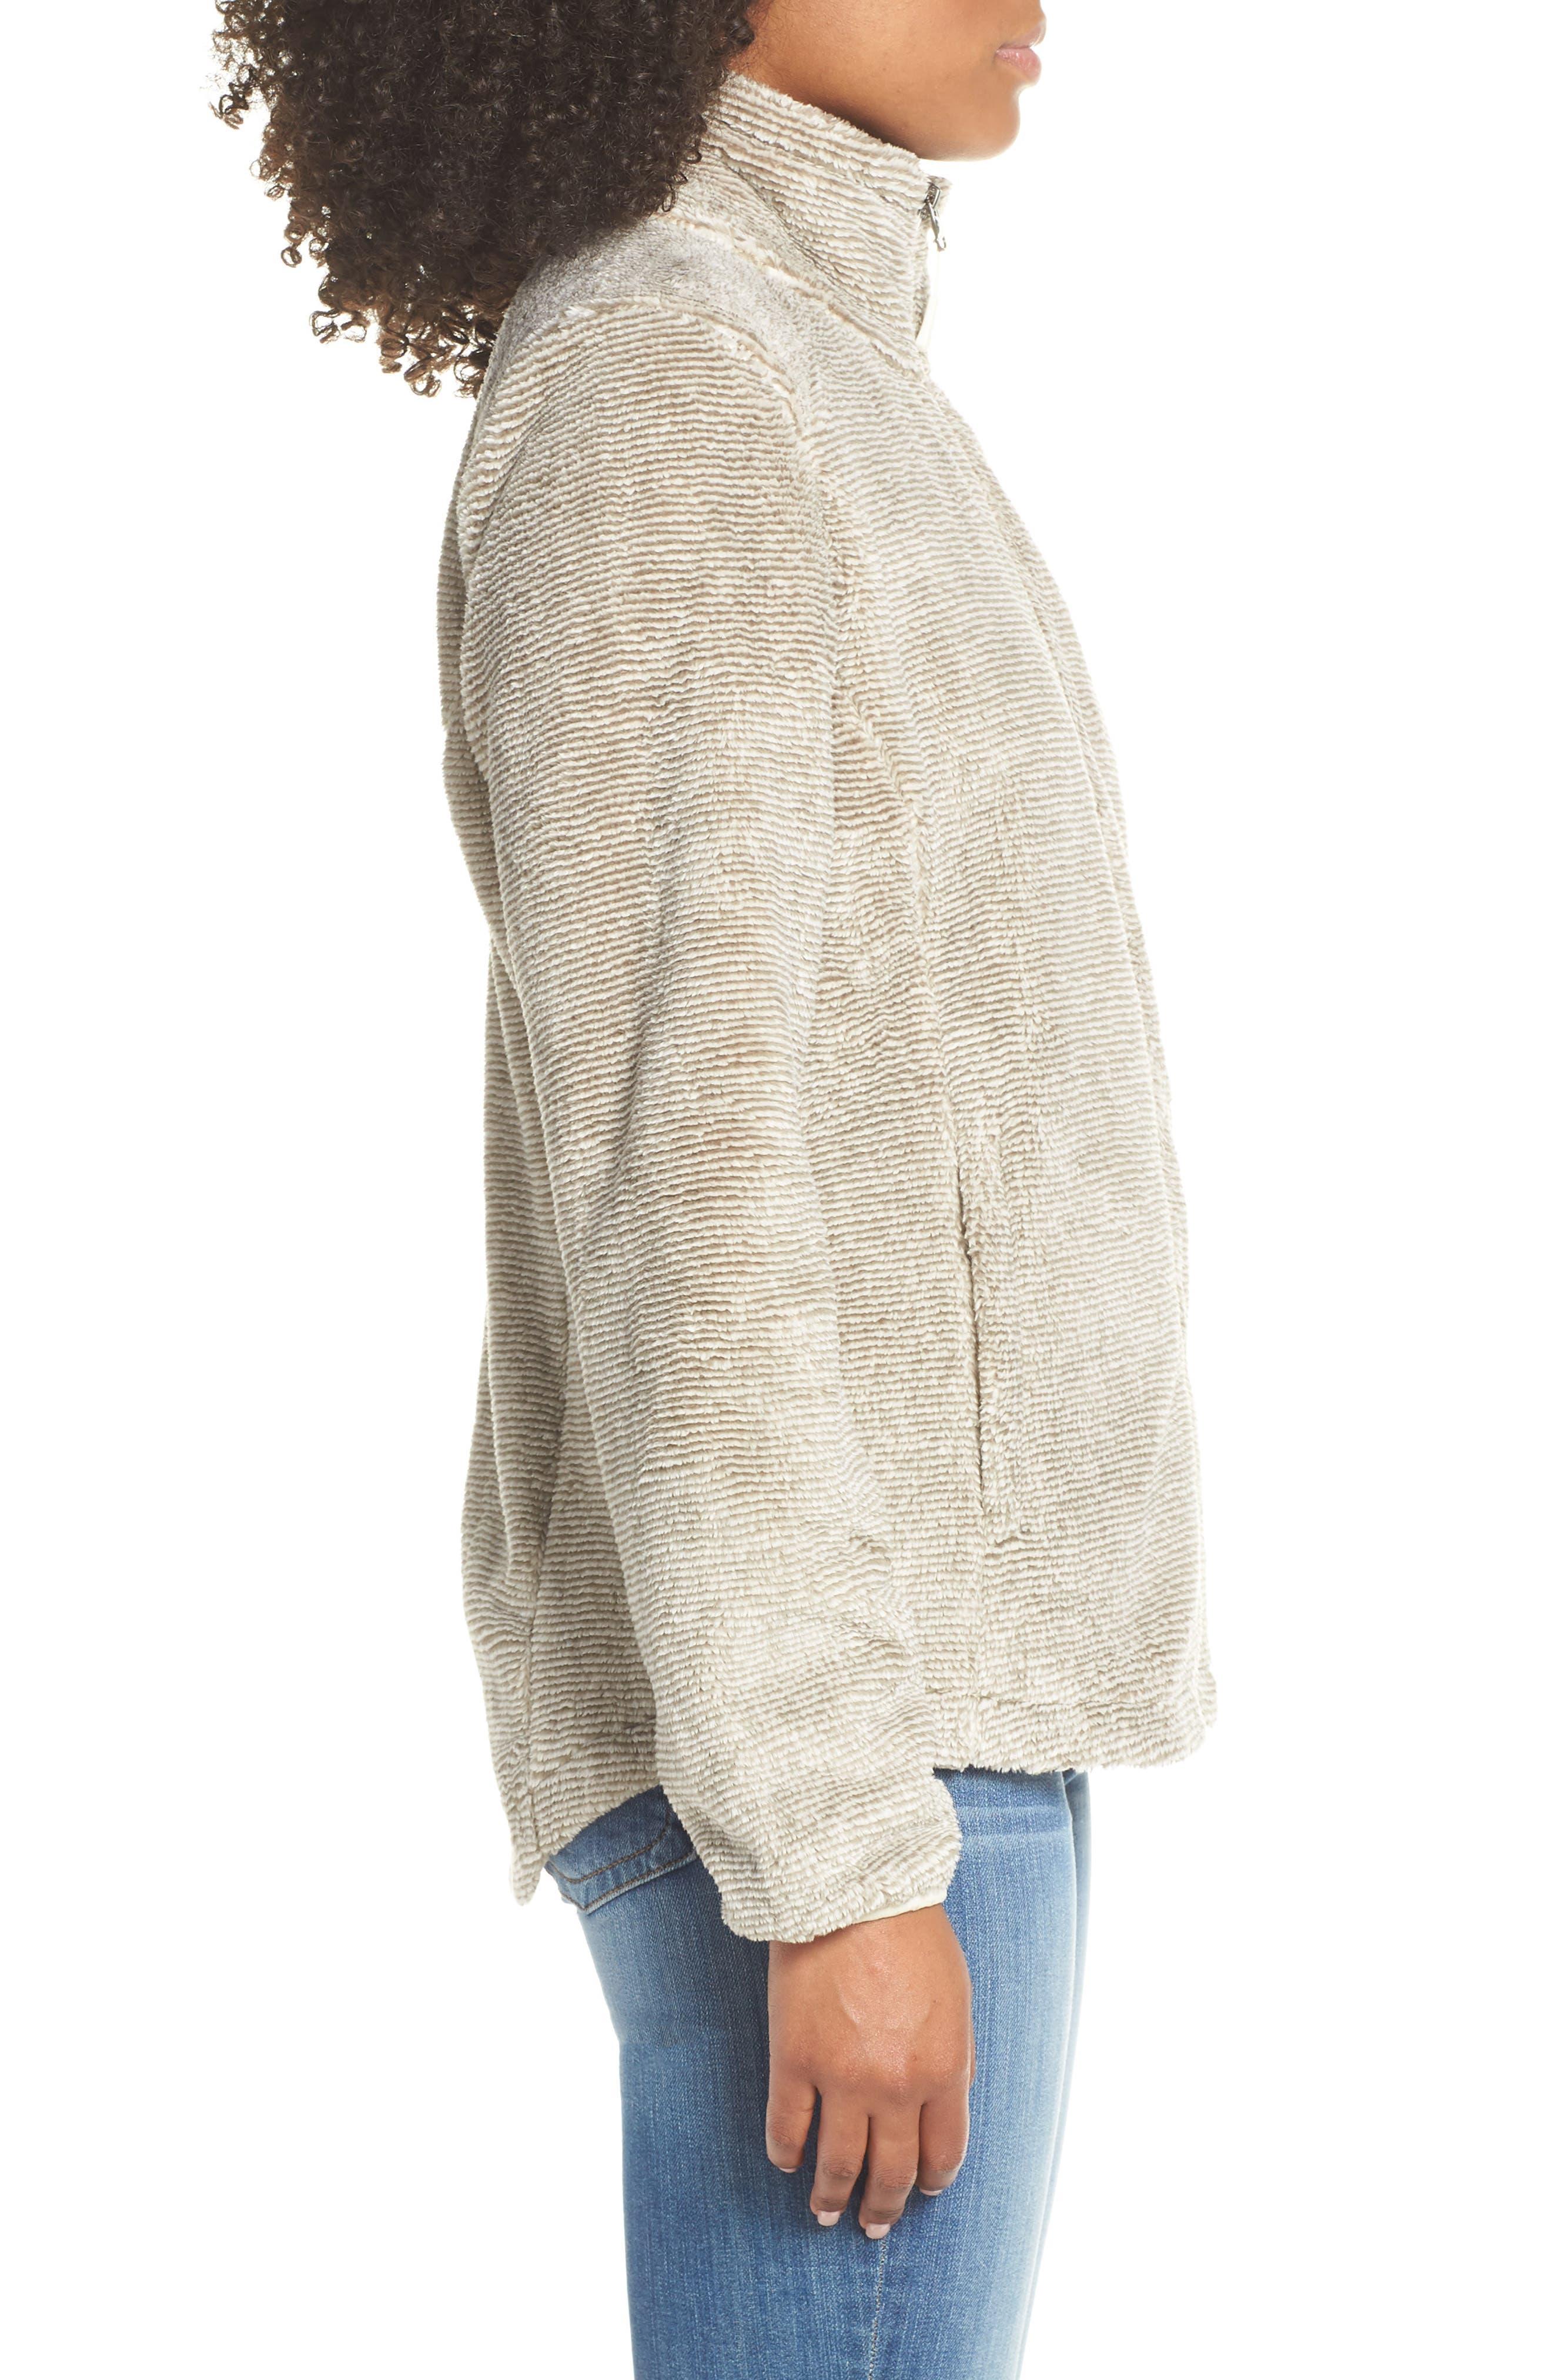 THE NORTH FACE, Osito 2 Stripe Fleece Jacket, Alternate thumbnail 4, color, GREY/ VINTAGE WHITE STRIPE